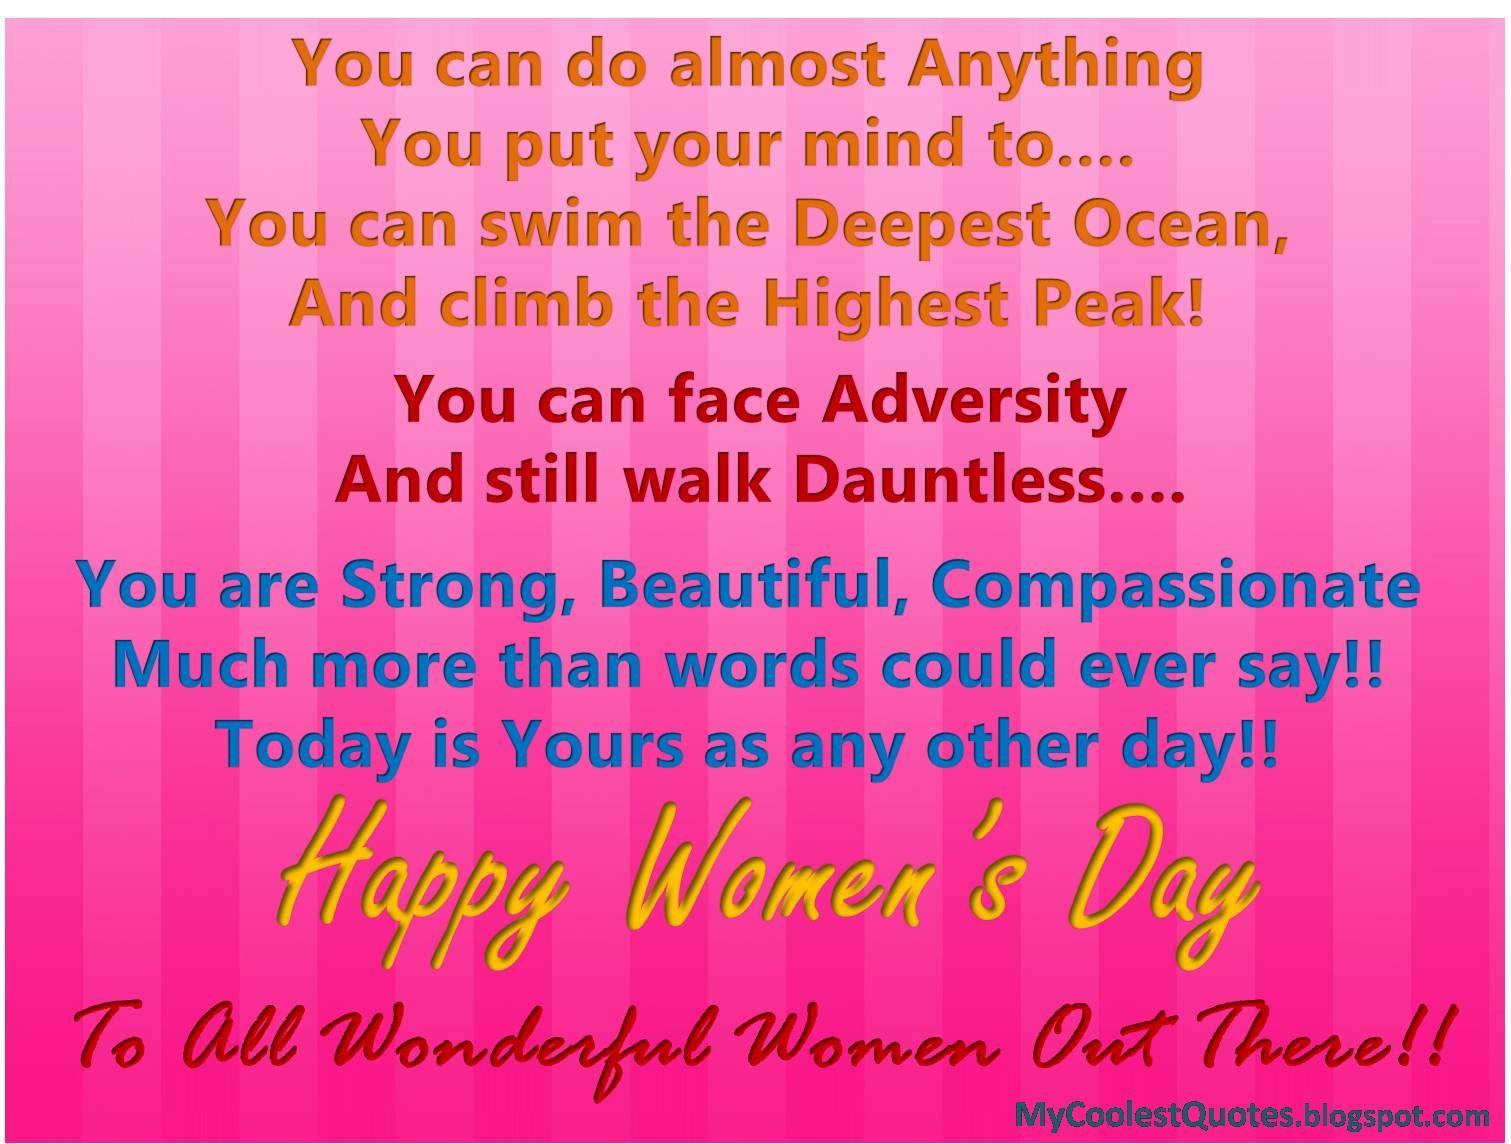 Pinterest Happy Quotes: Happy Women's Day : Women Can